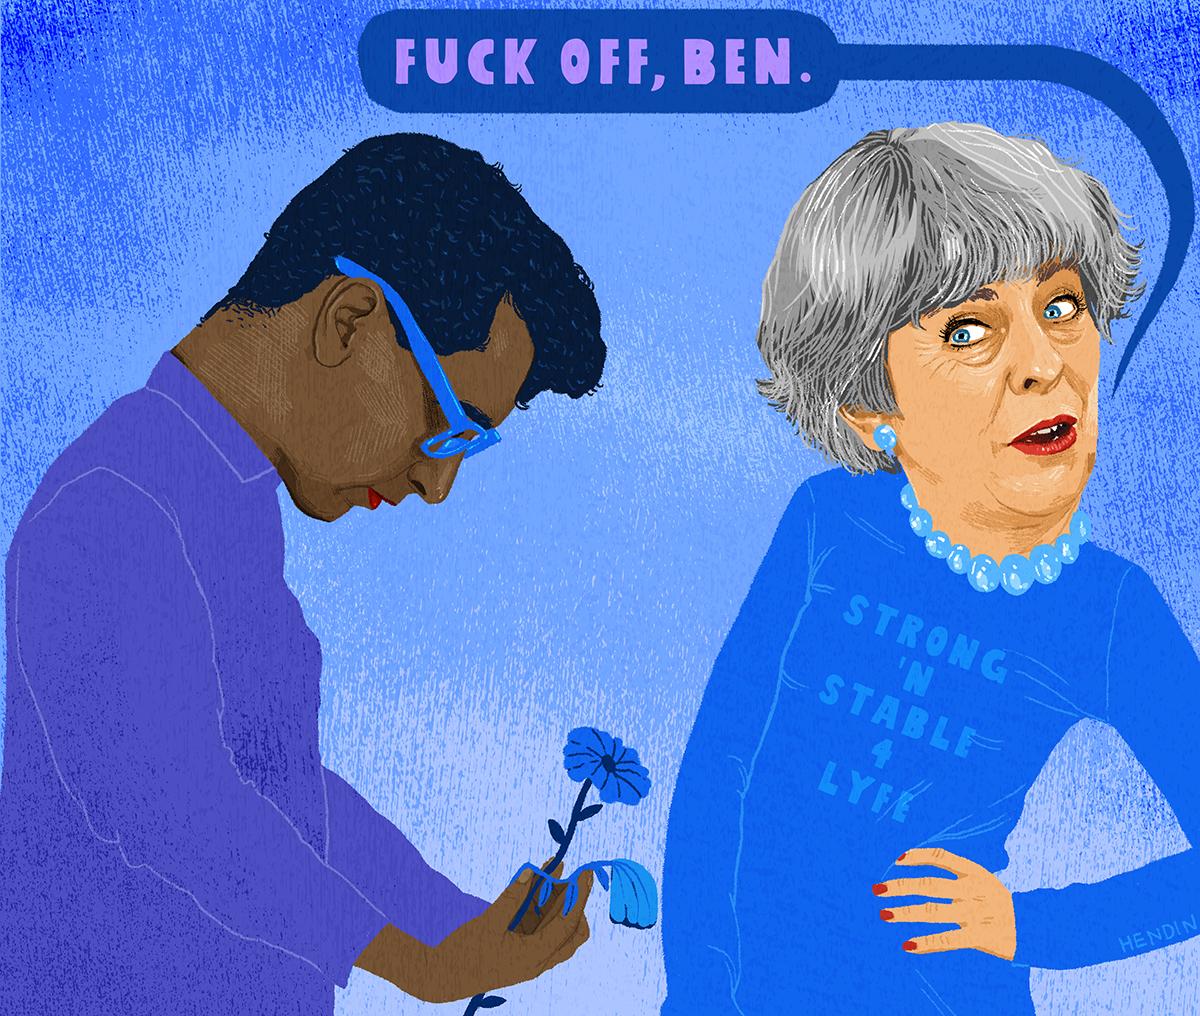 rebecca-hendin-buzzfeed-general-election-dream-tweets-illustration-may-2